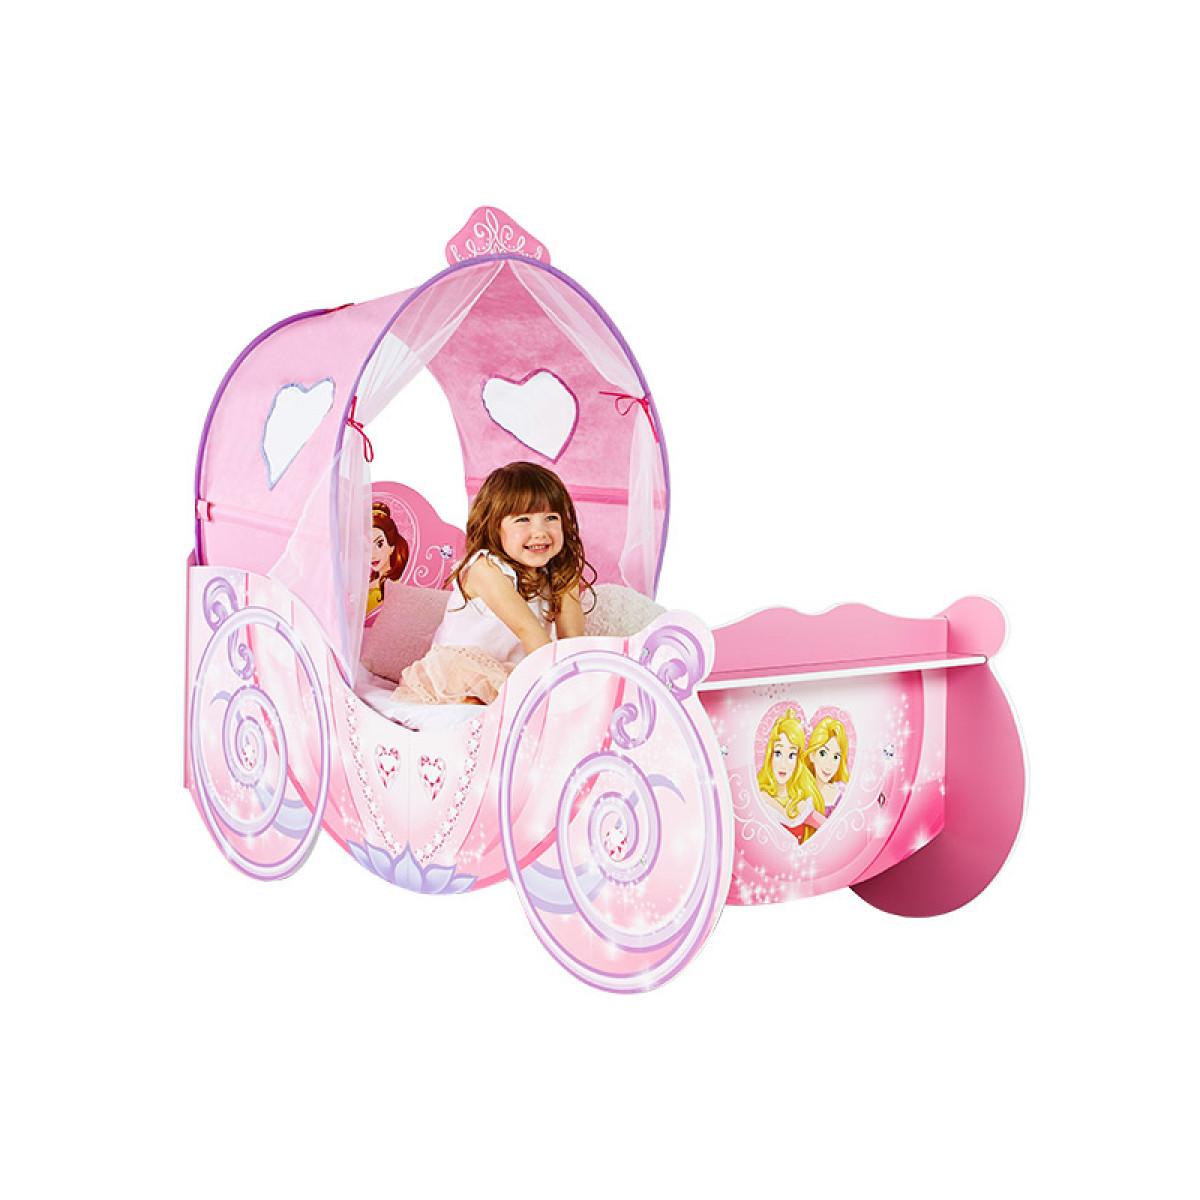 Disney Princess Carriage Feature Toddler Bed Plus Foam ...